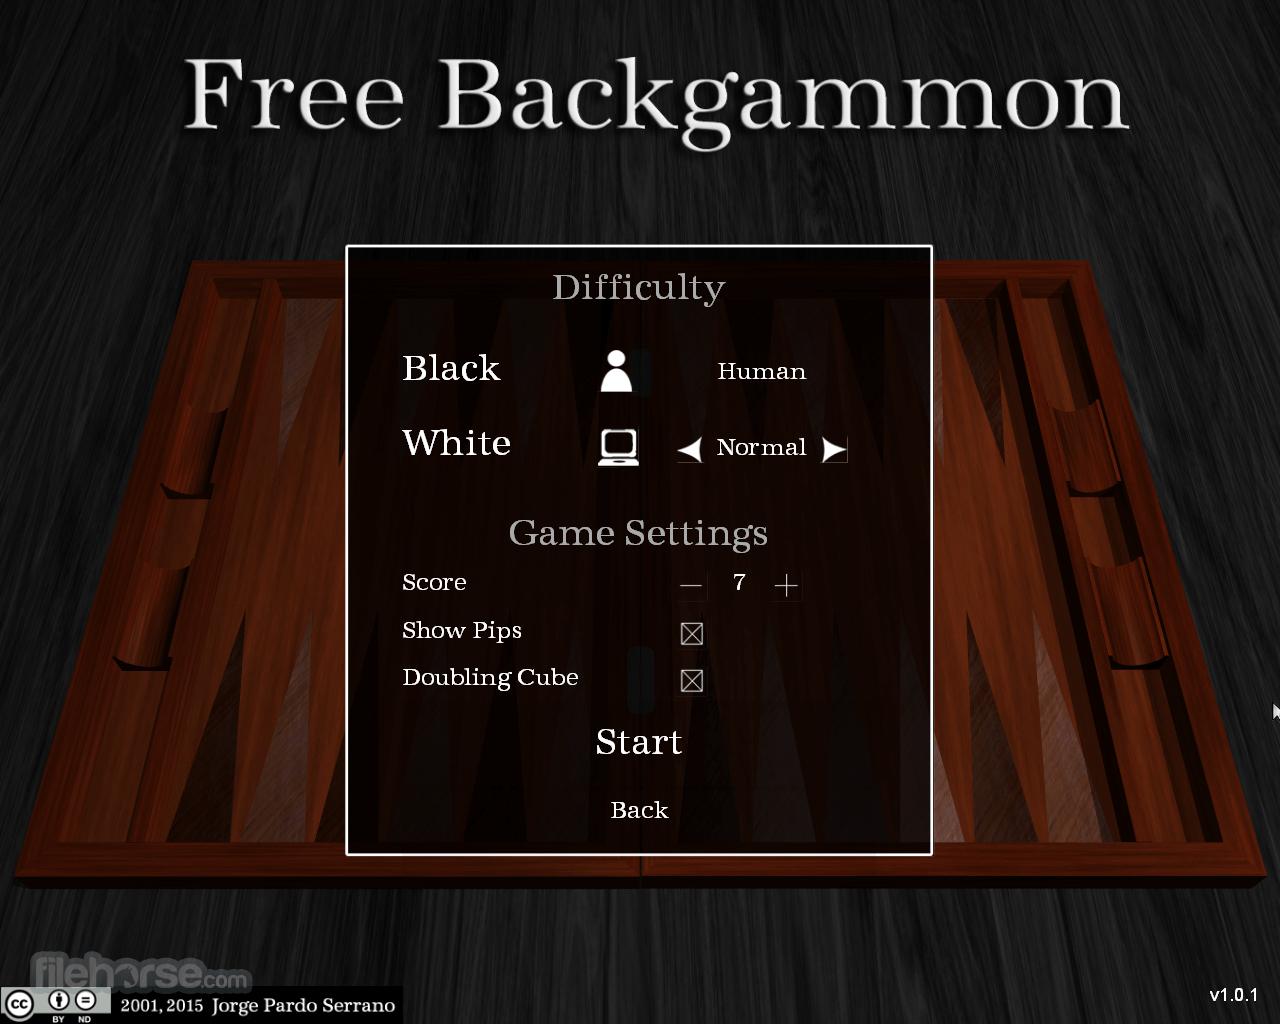 Free Backgammon 1.0.1 Screenshot 2